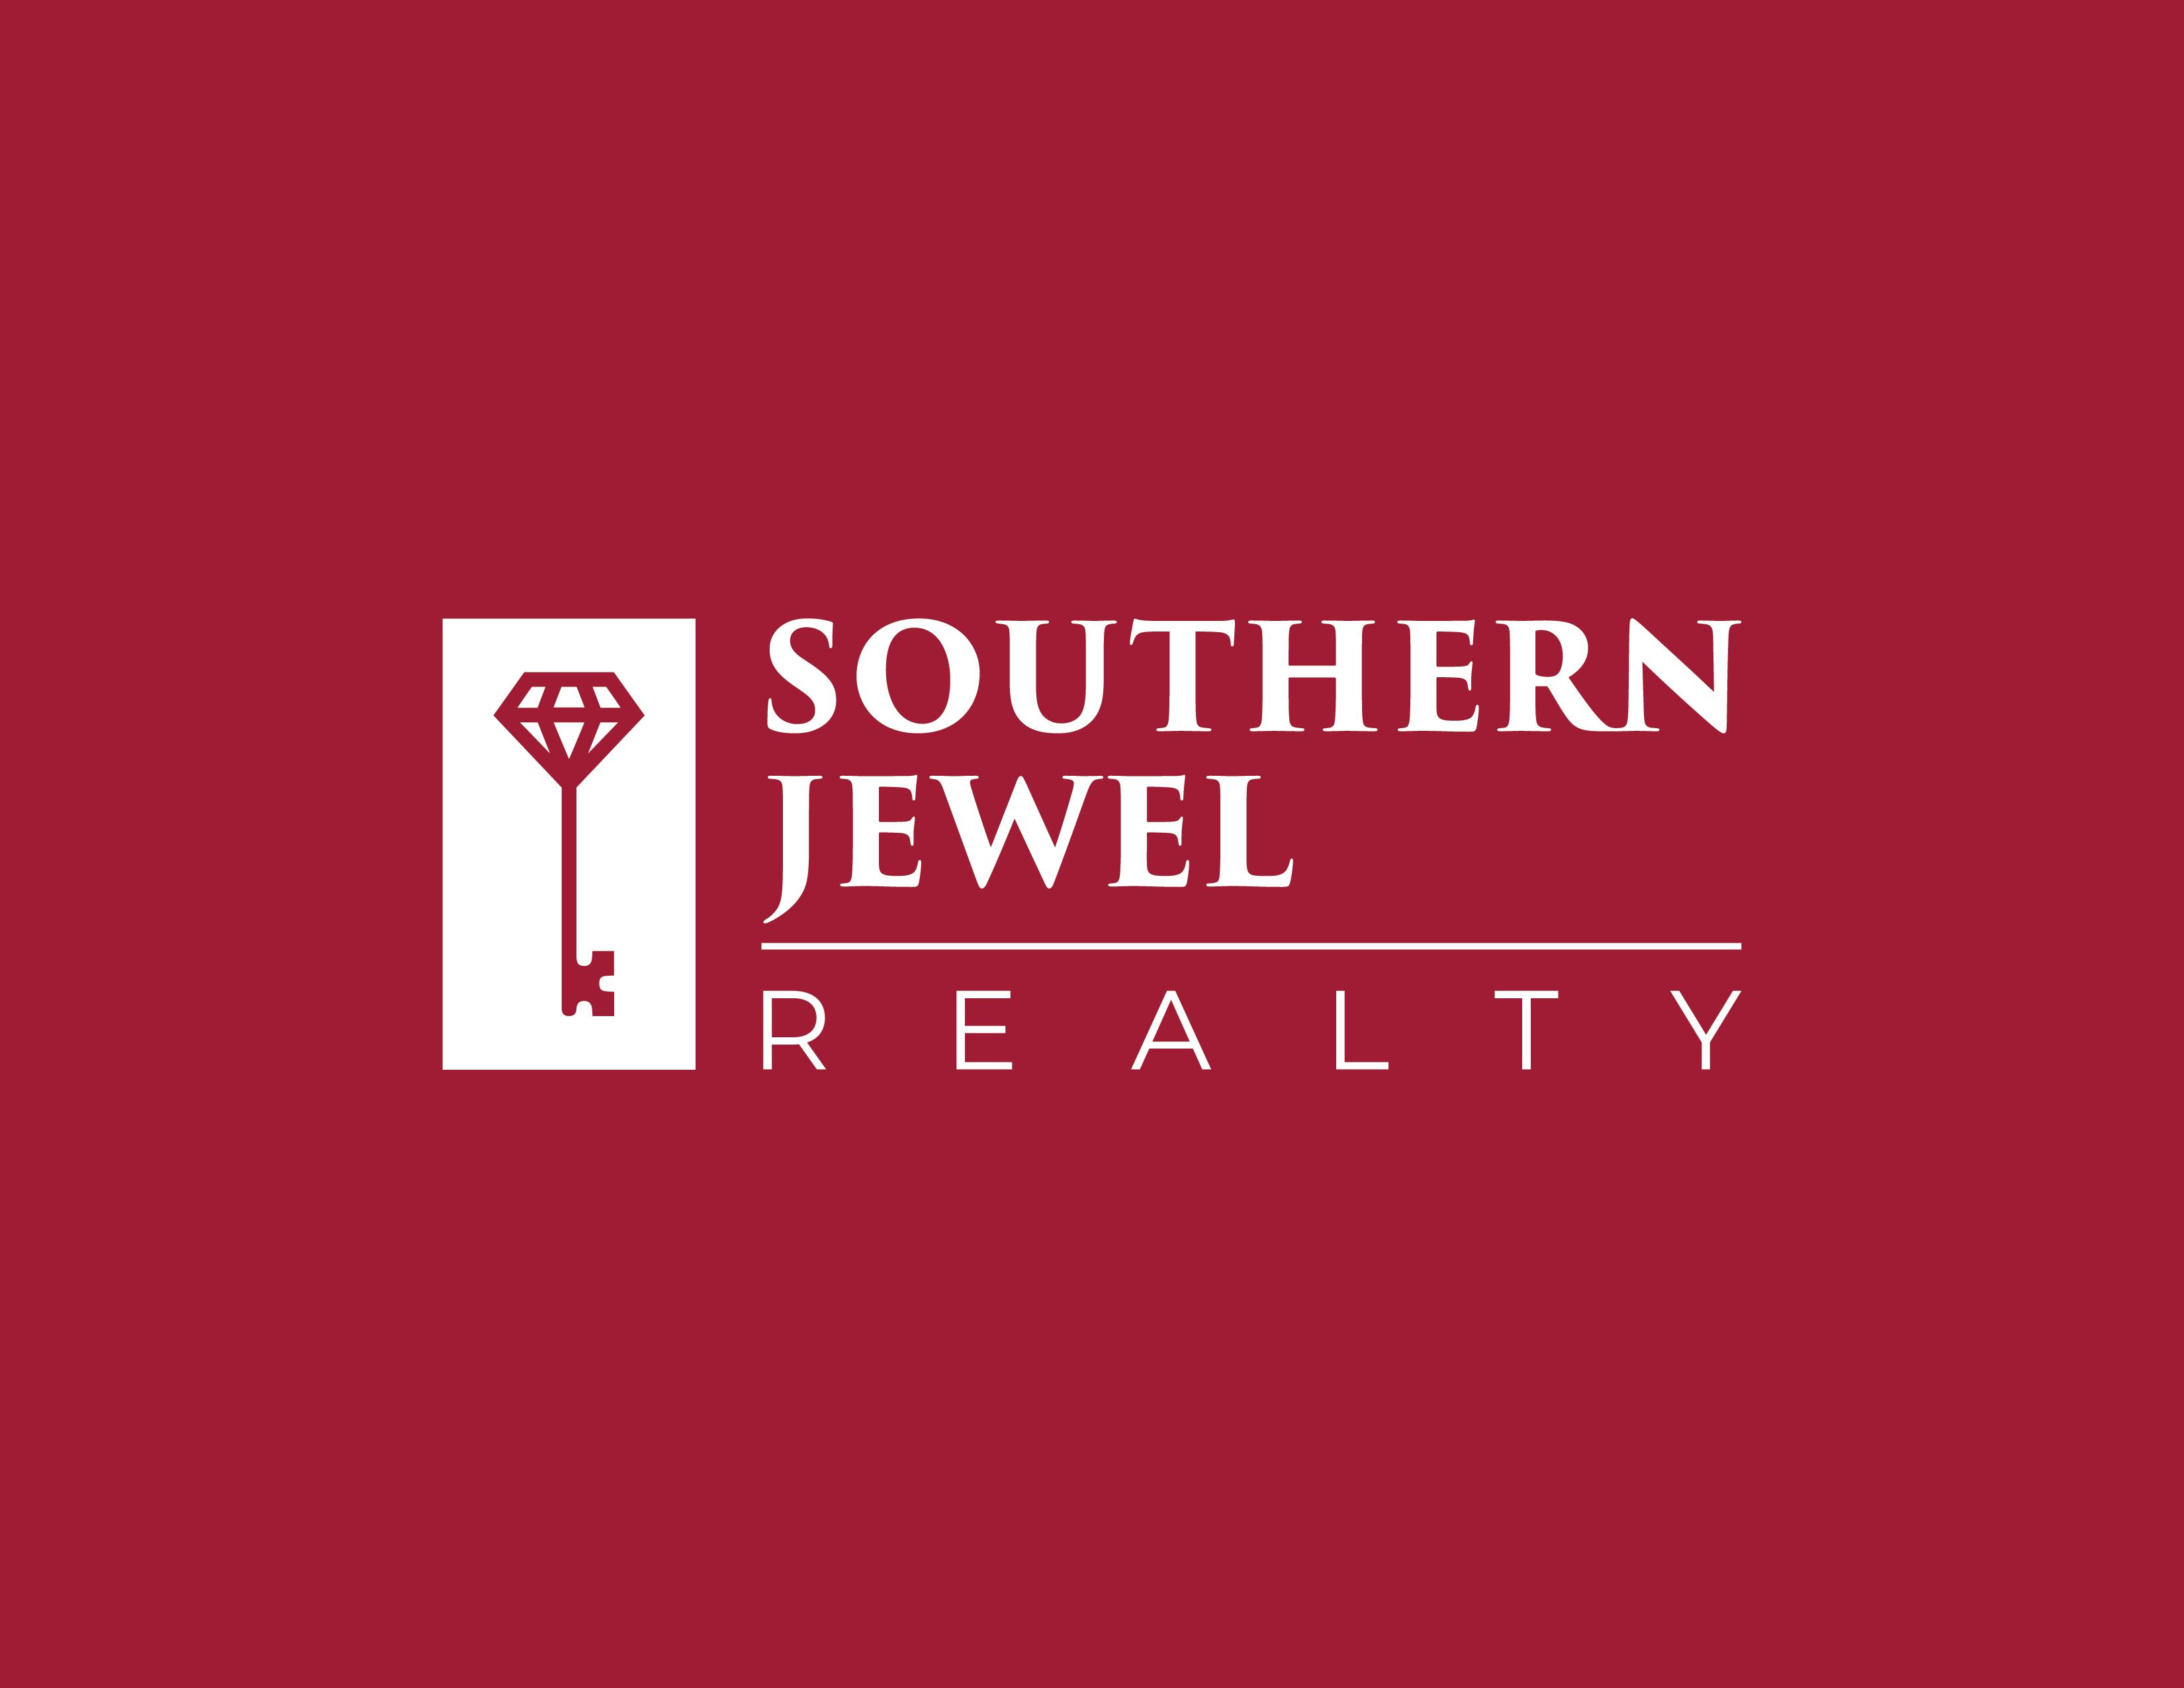 Southern_Jewel_Realty(FA)-02 XCRIMSON